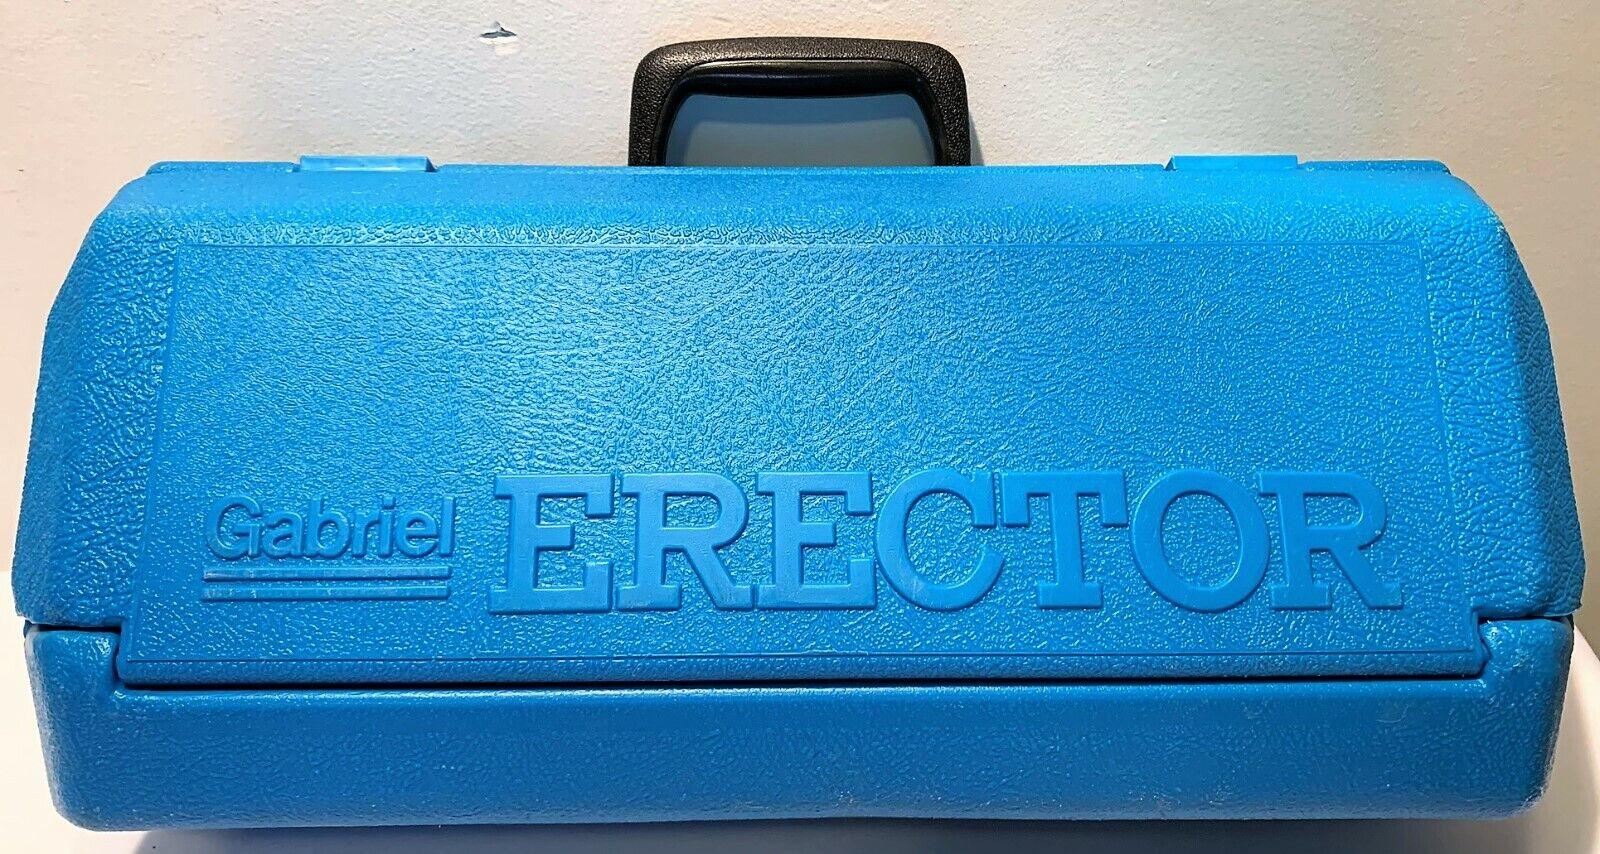 Vintage Gabriel Erector Set in bluee Case FREE SHIPPING